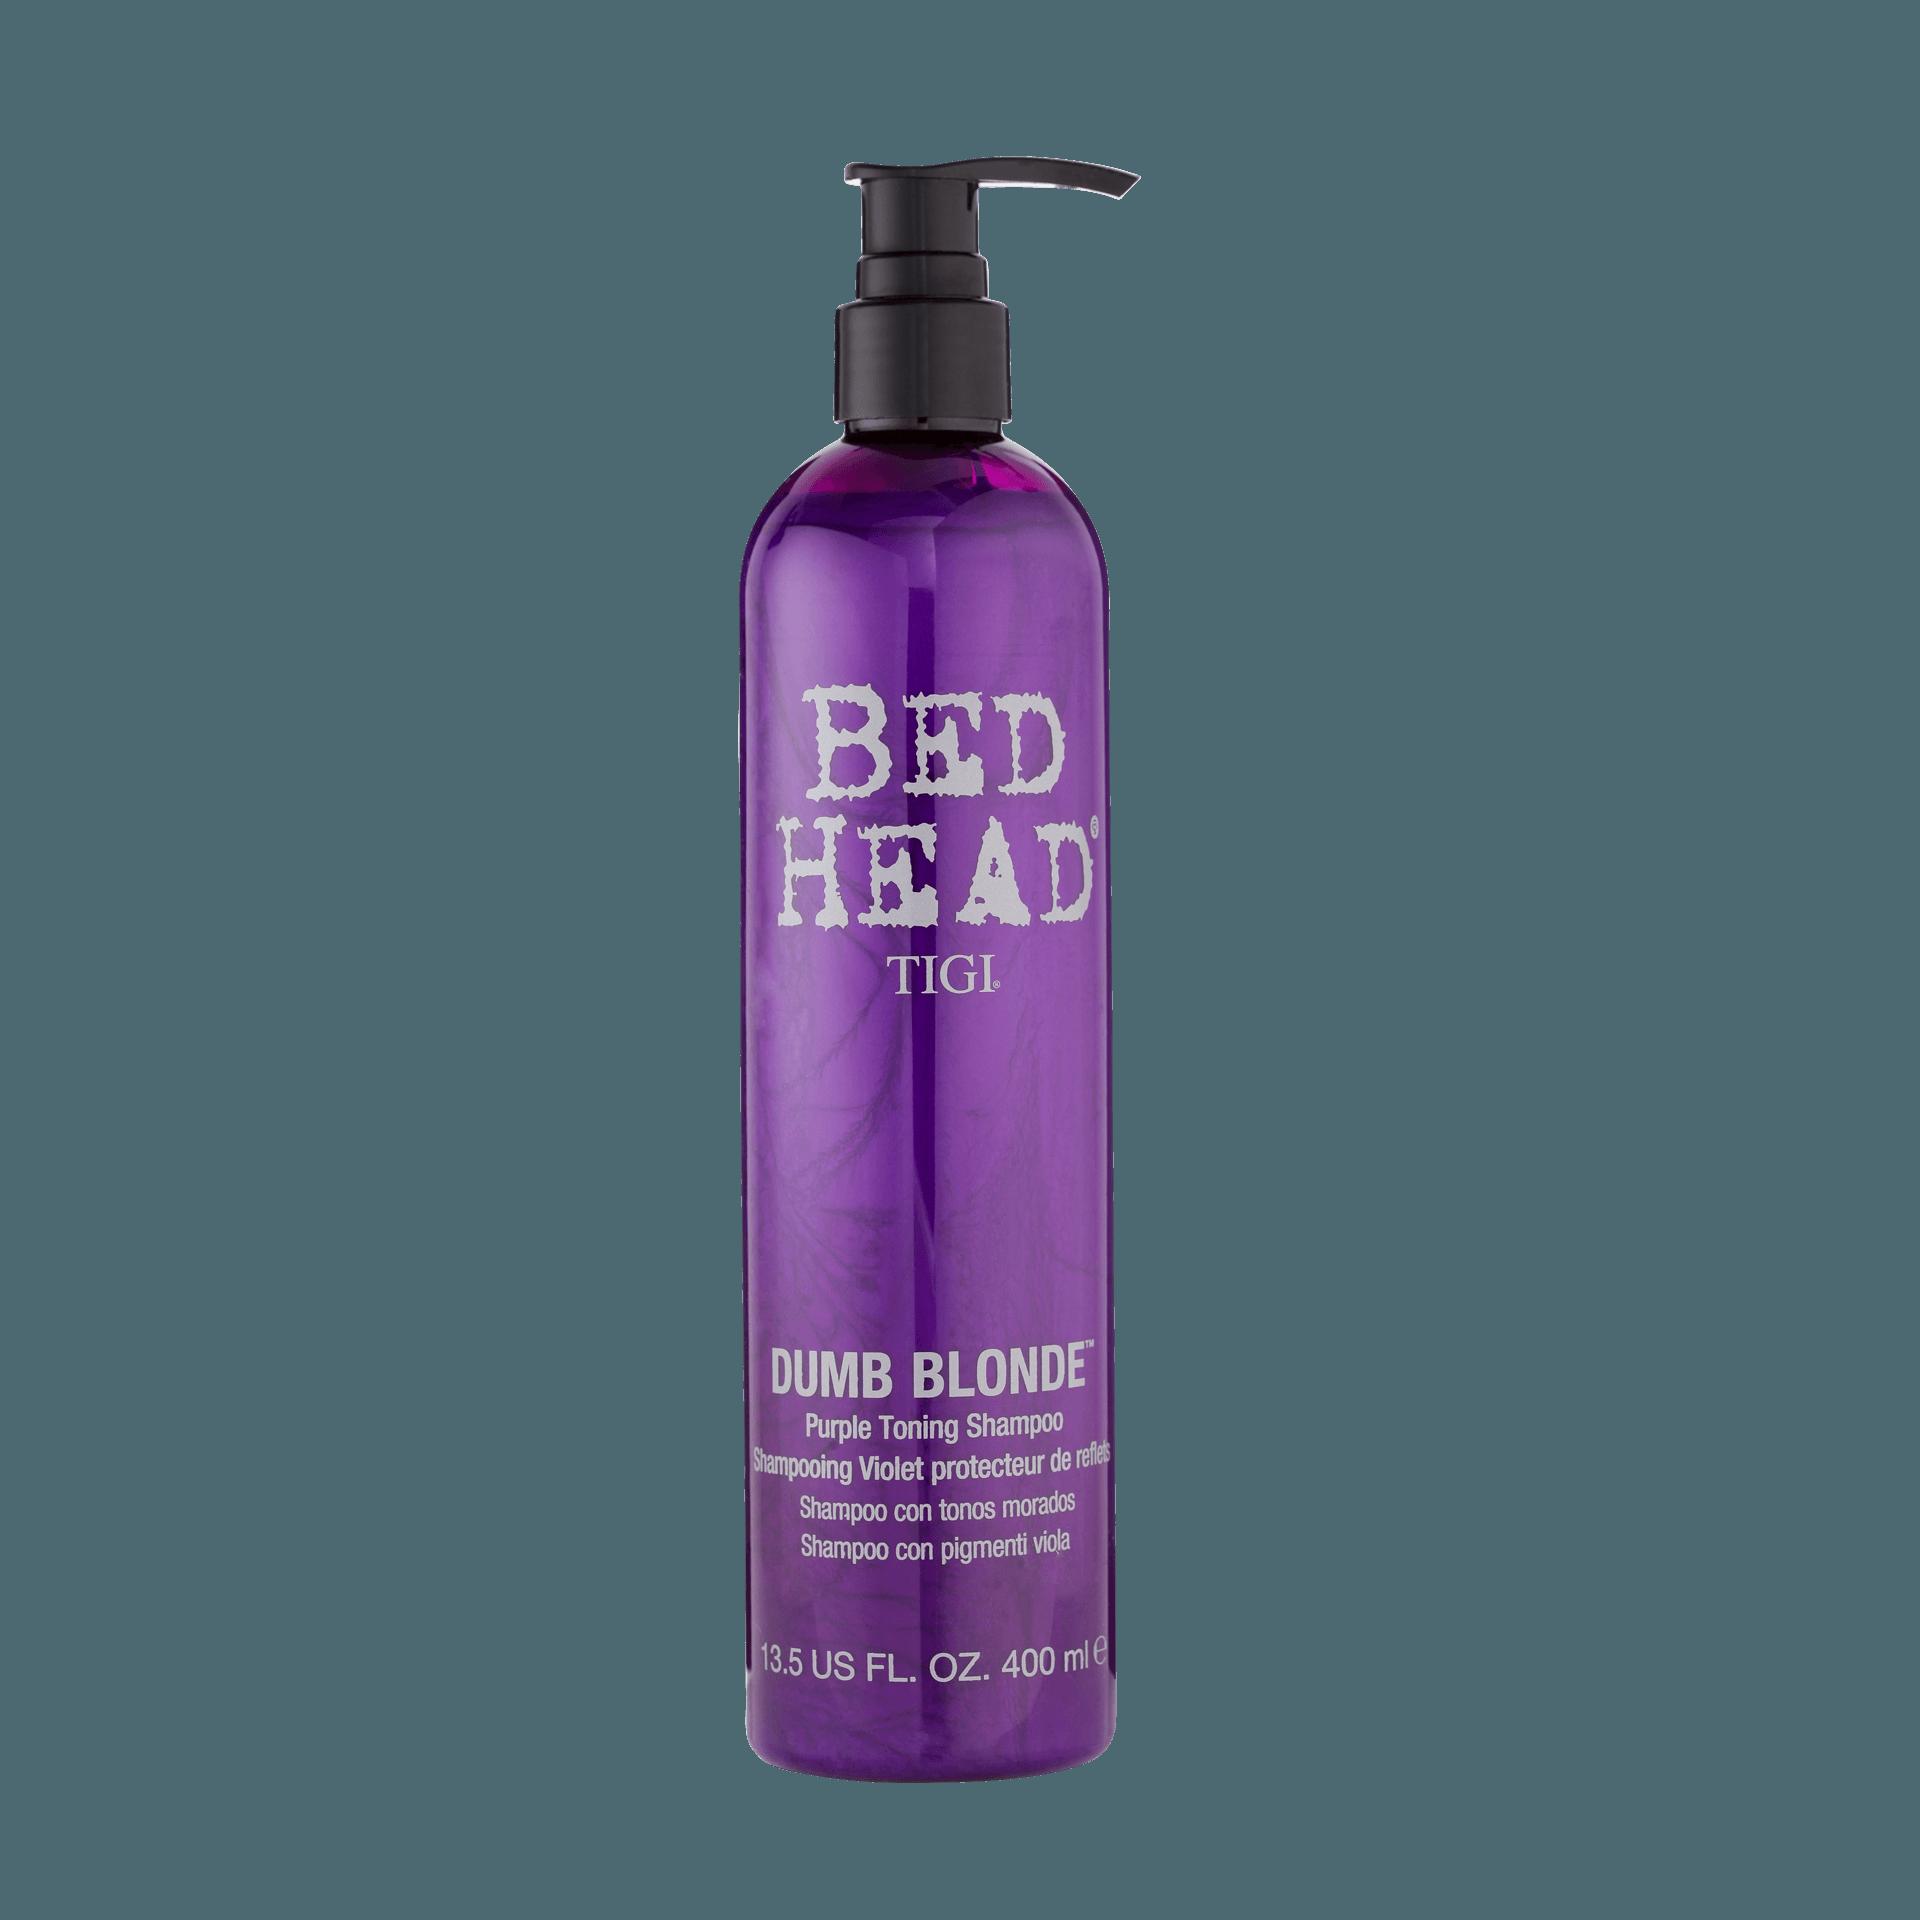 TIGI Bed Head Dumb Blonde Purple Toning Shampoo